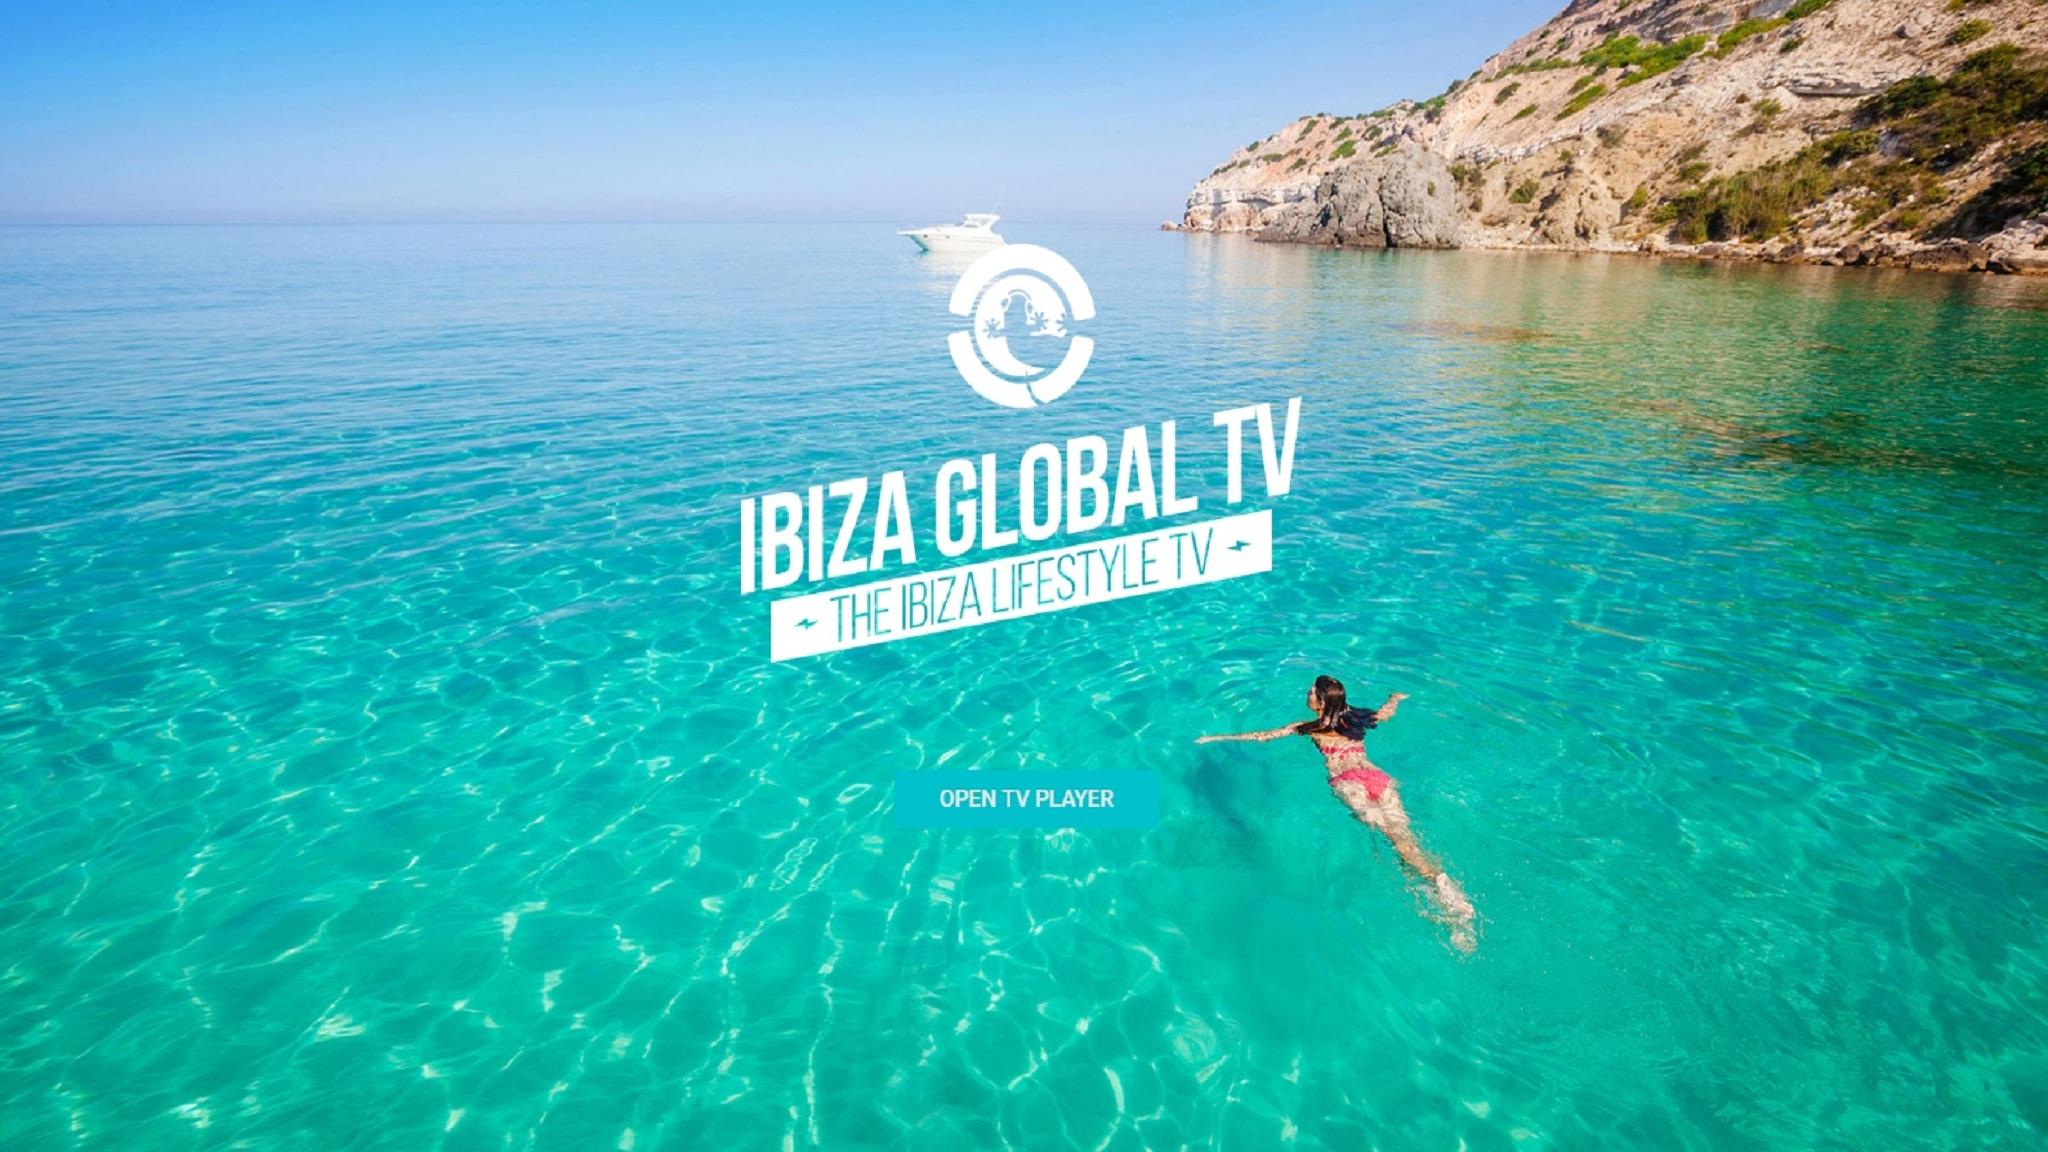 LIVE RADIO SHOWS - Ibiza Global TV